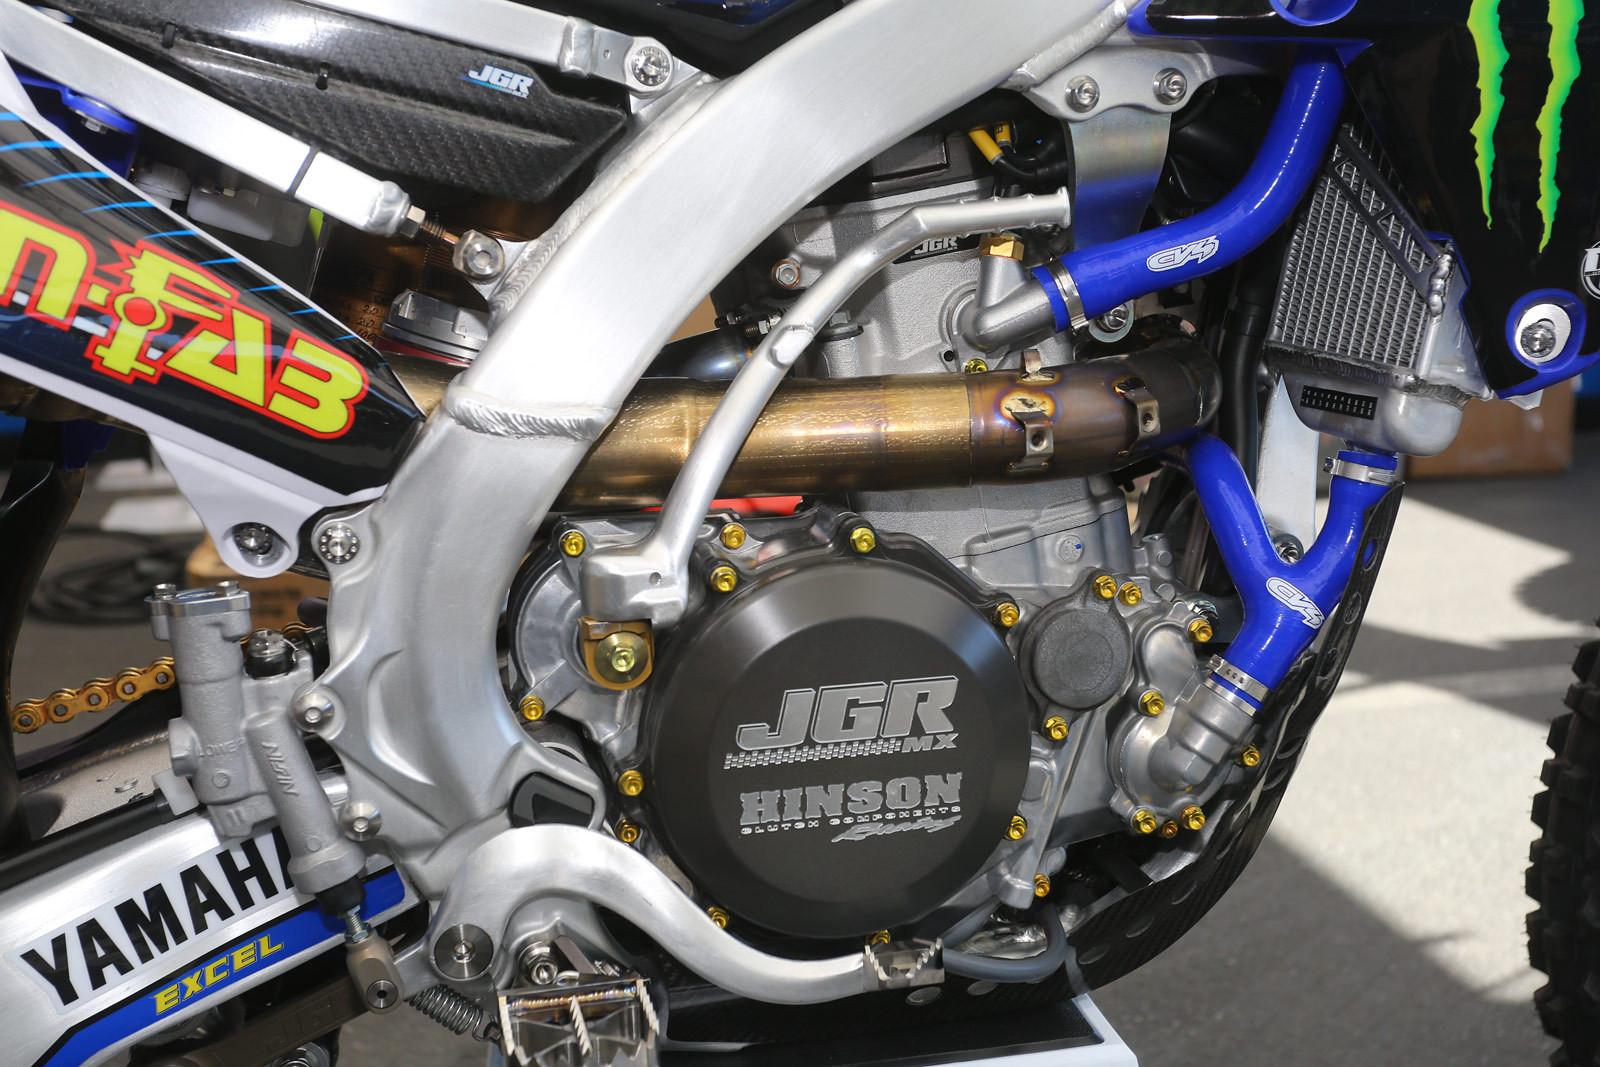 AutoTrader.com/Toyota/Yamaha - Vital MX Pit Bits: Anaheim 1 - Motocross Pictures - Vital MX